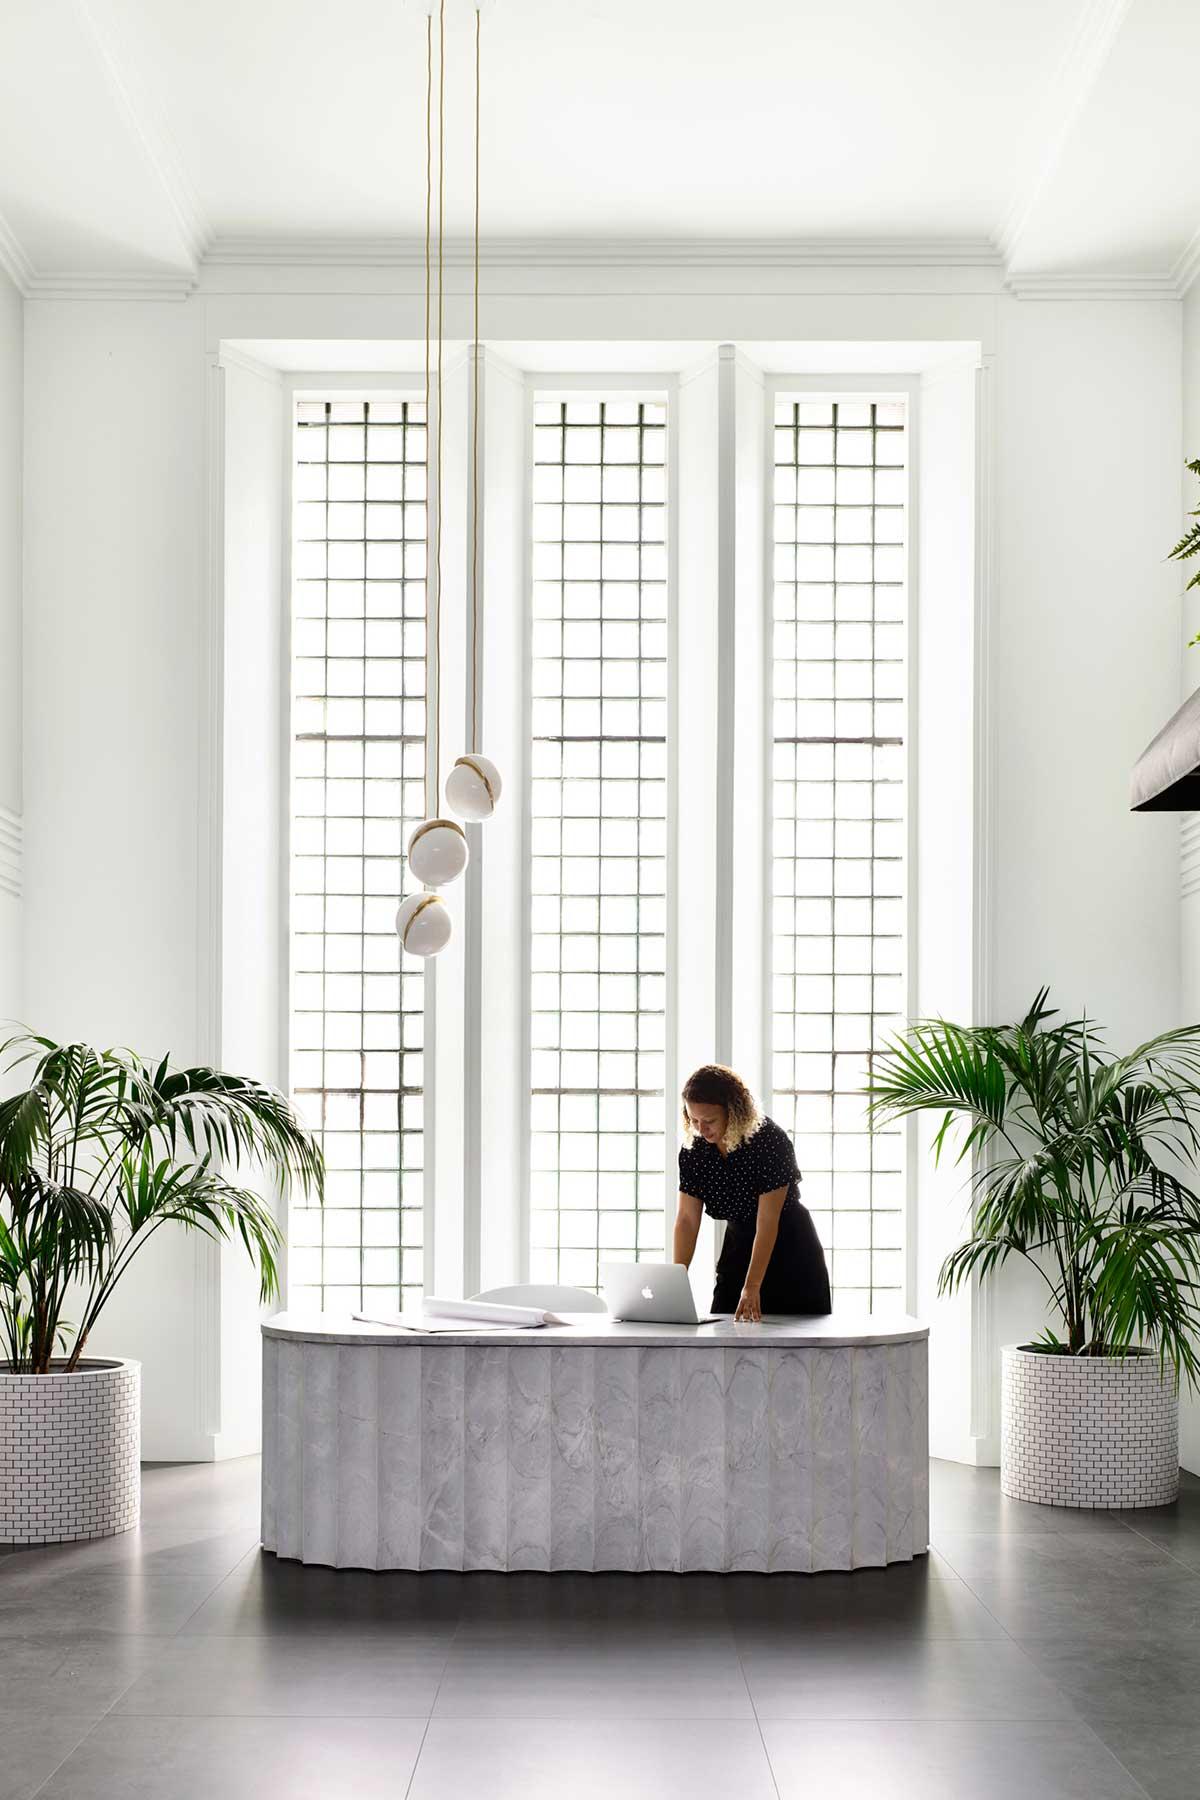 ©-Adam-Robinson-Design-Accent-Plants-11.jpg